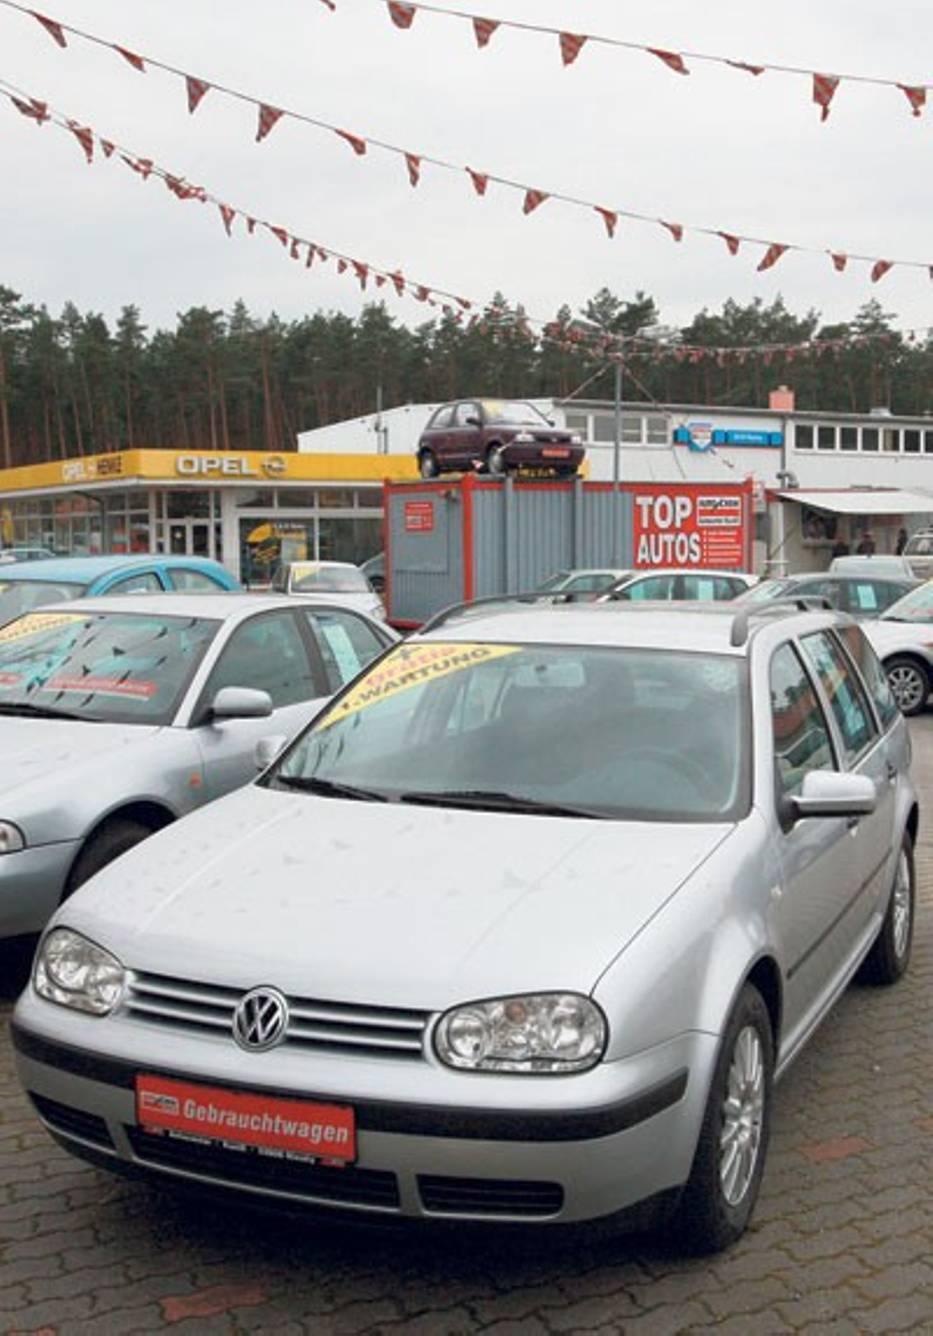 Marka VW najpopularniejsza